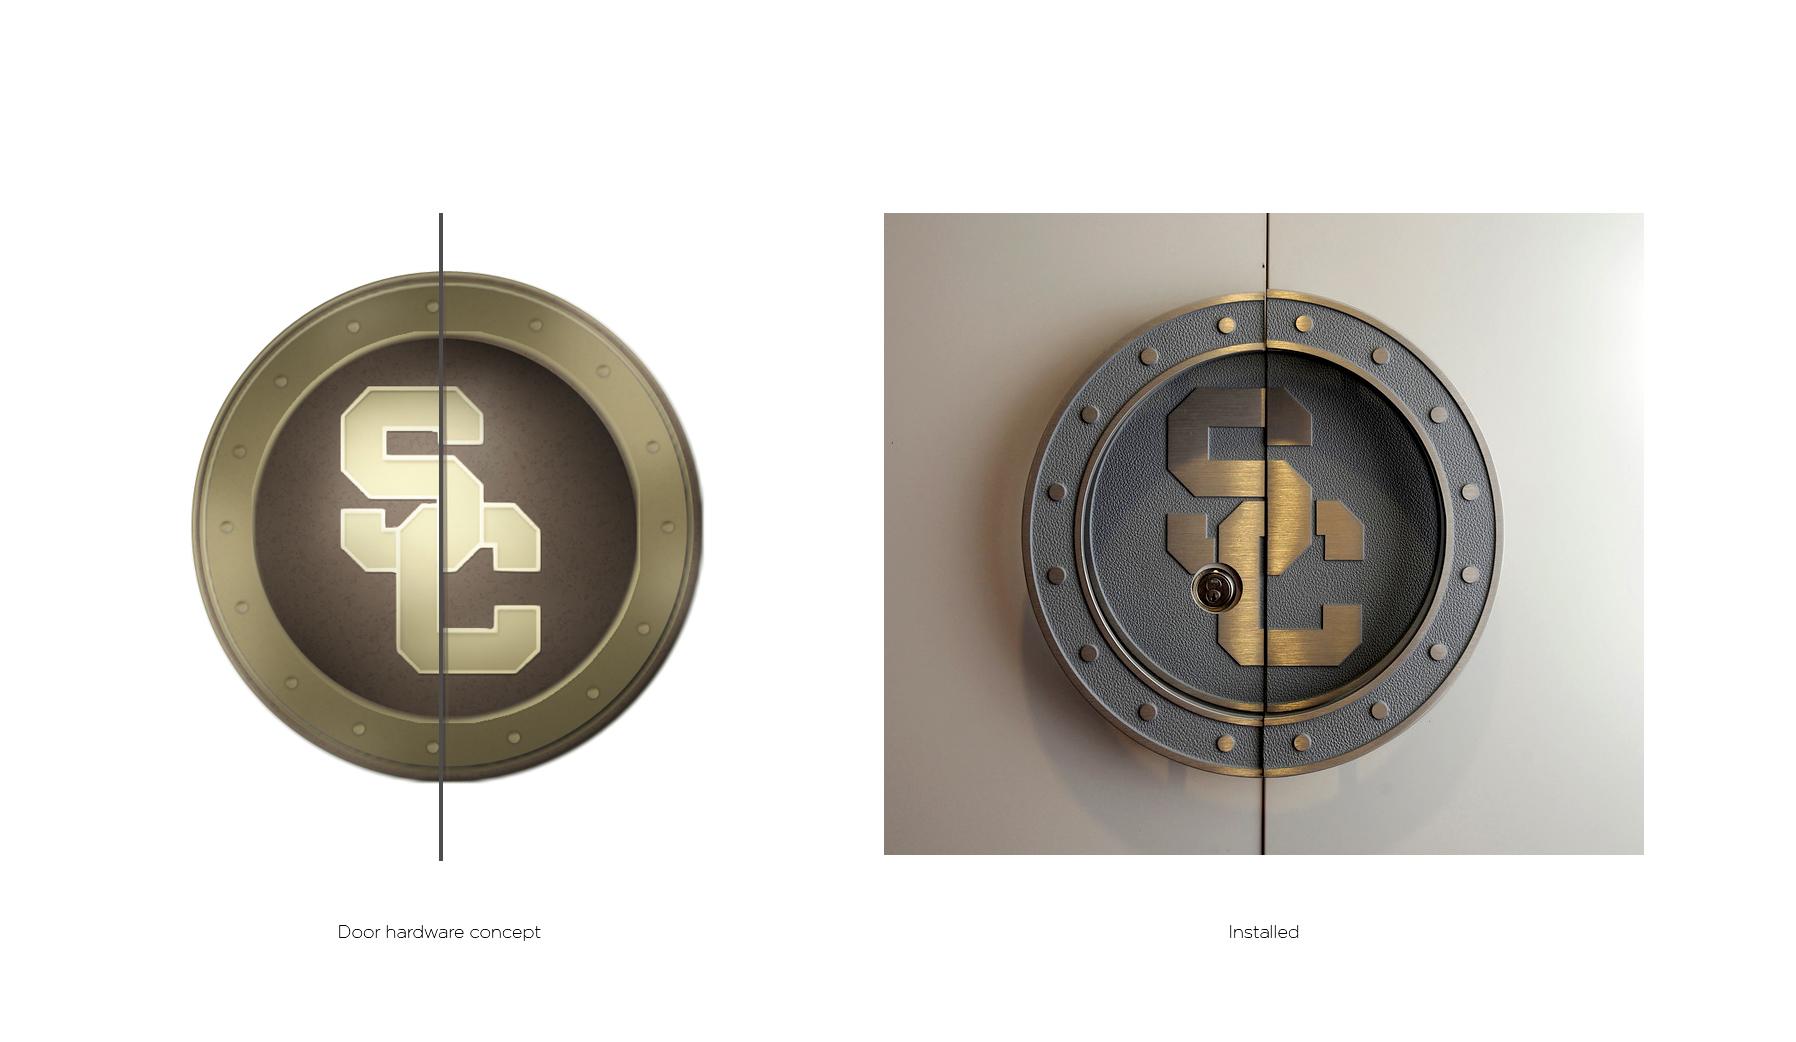 John McKay Center installation image: Concept and installation of door handle designs